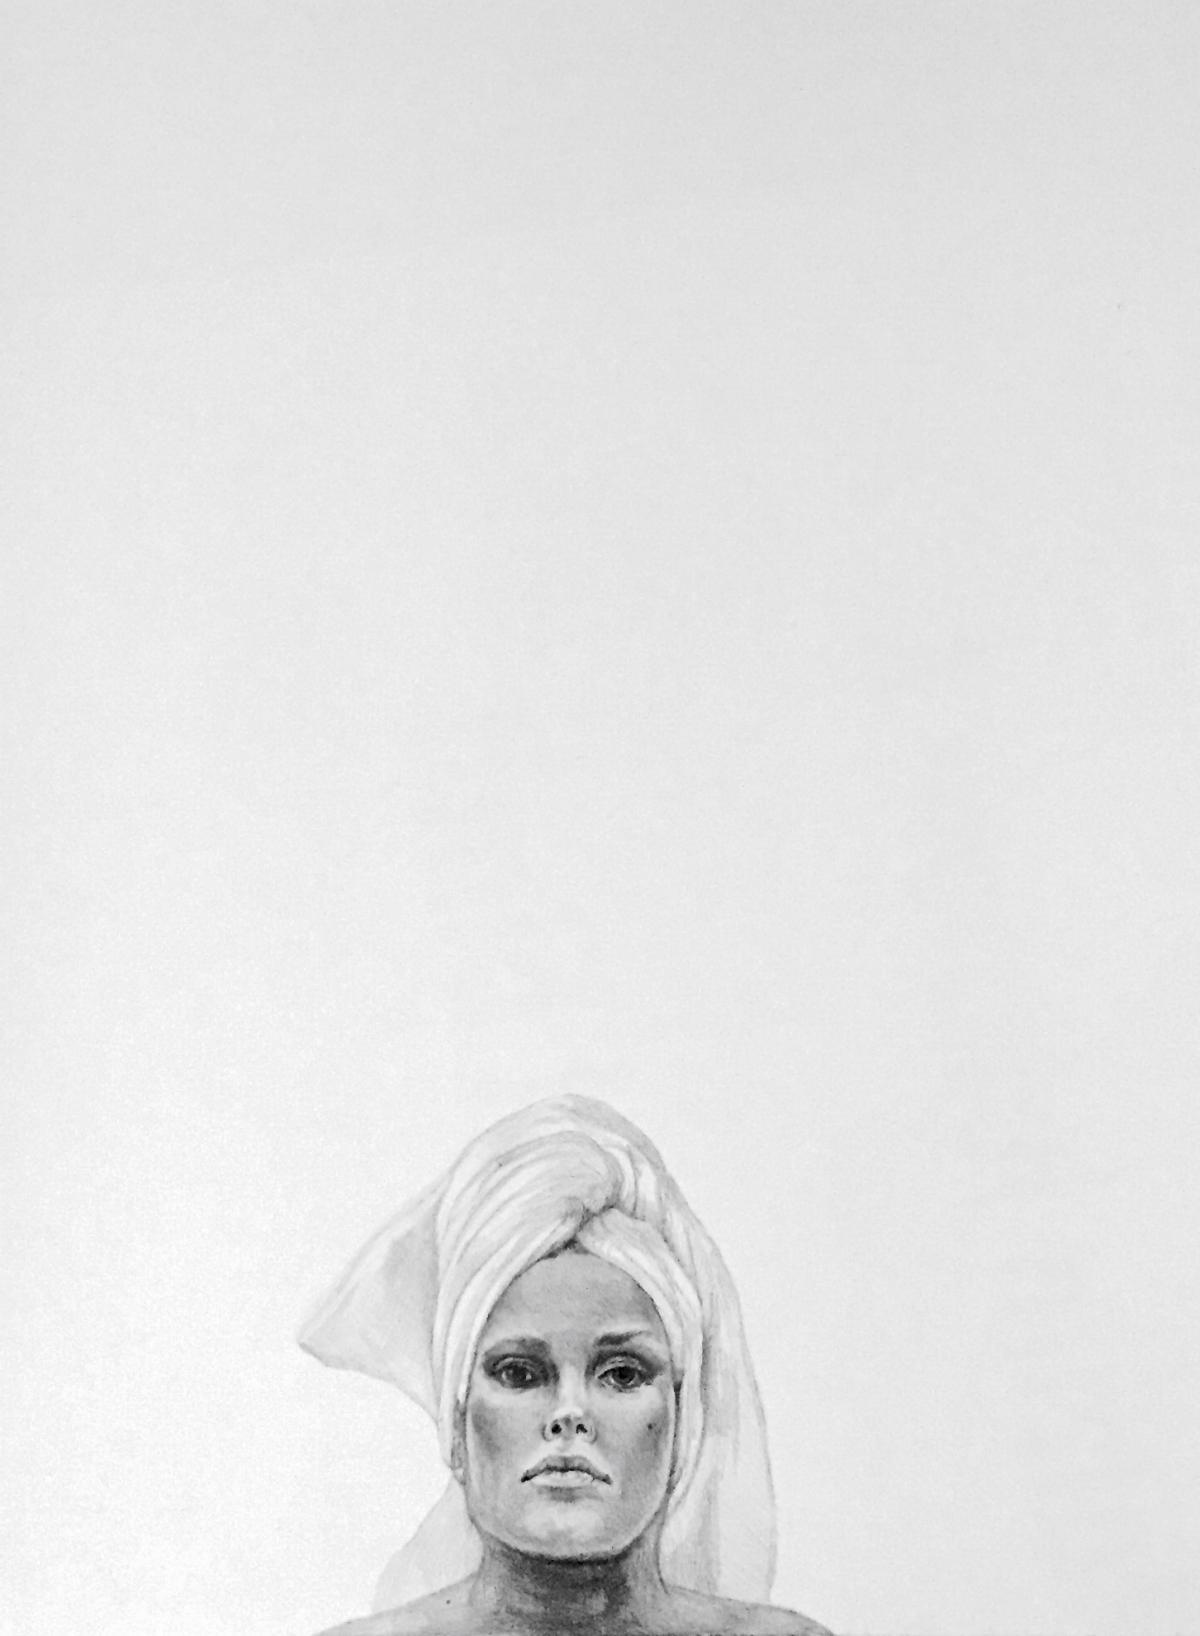 White Towel Veil (2016) by Michelle Wiener Ohm (Ryman '00)